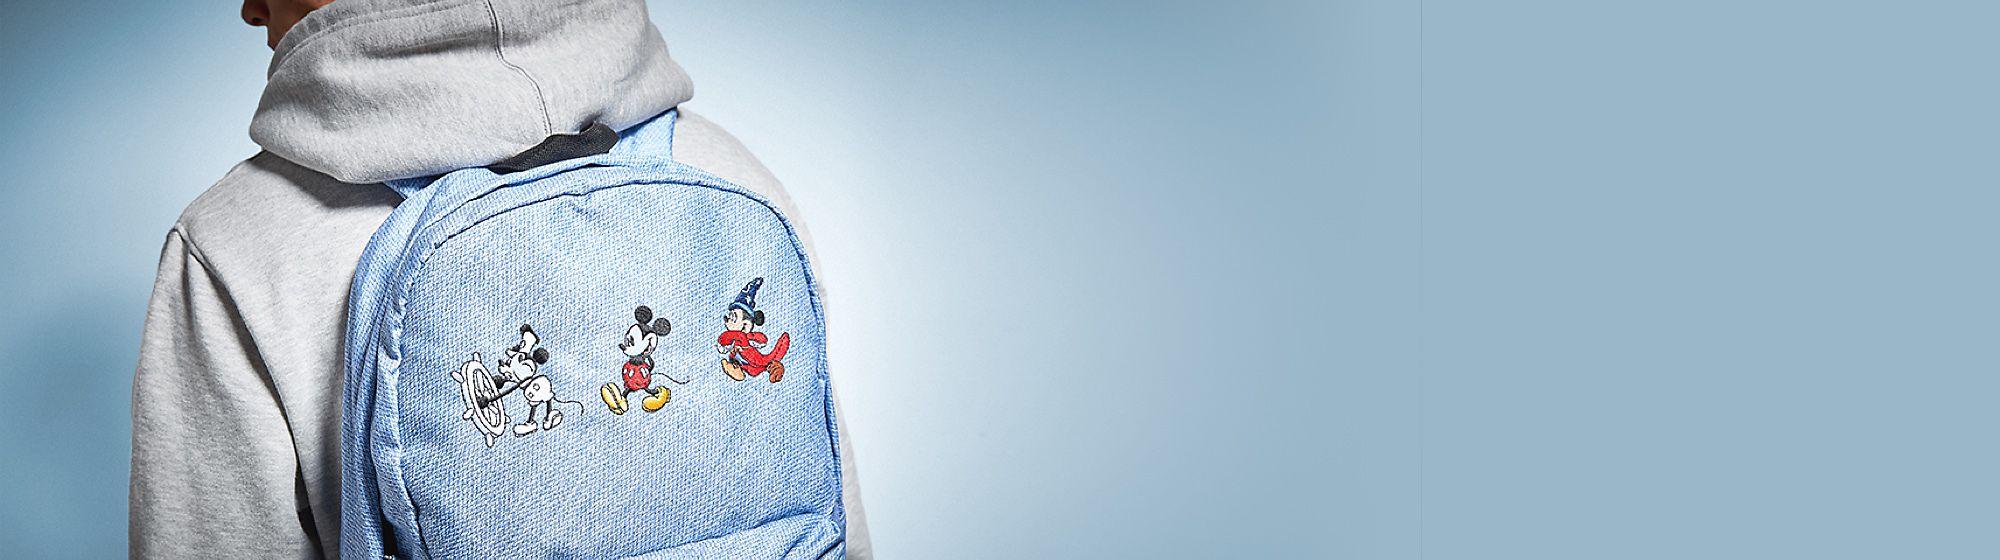 Mochila de Mickey Mouse Solo por 10.90€. En compras a partir de 15€ o más